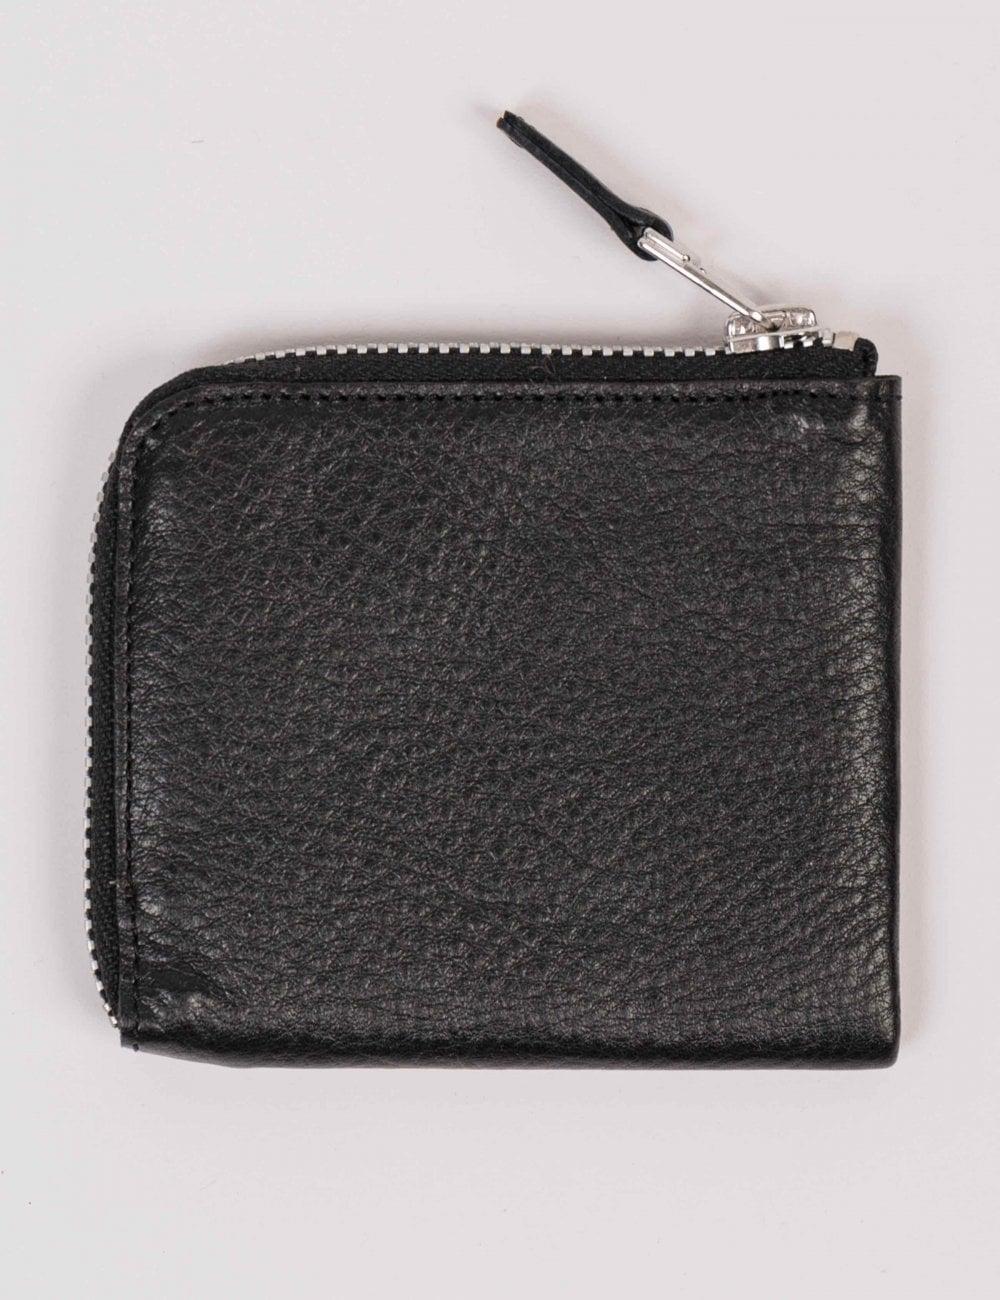 Carhartt WIP Half Zip Wallet - Black - Accessories from Fat Buddha ... cee24e680